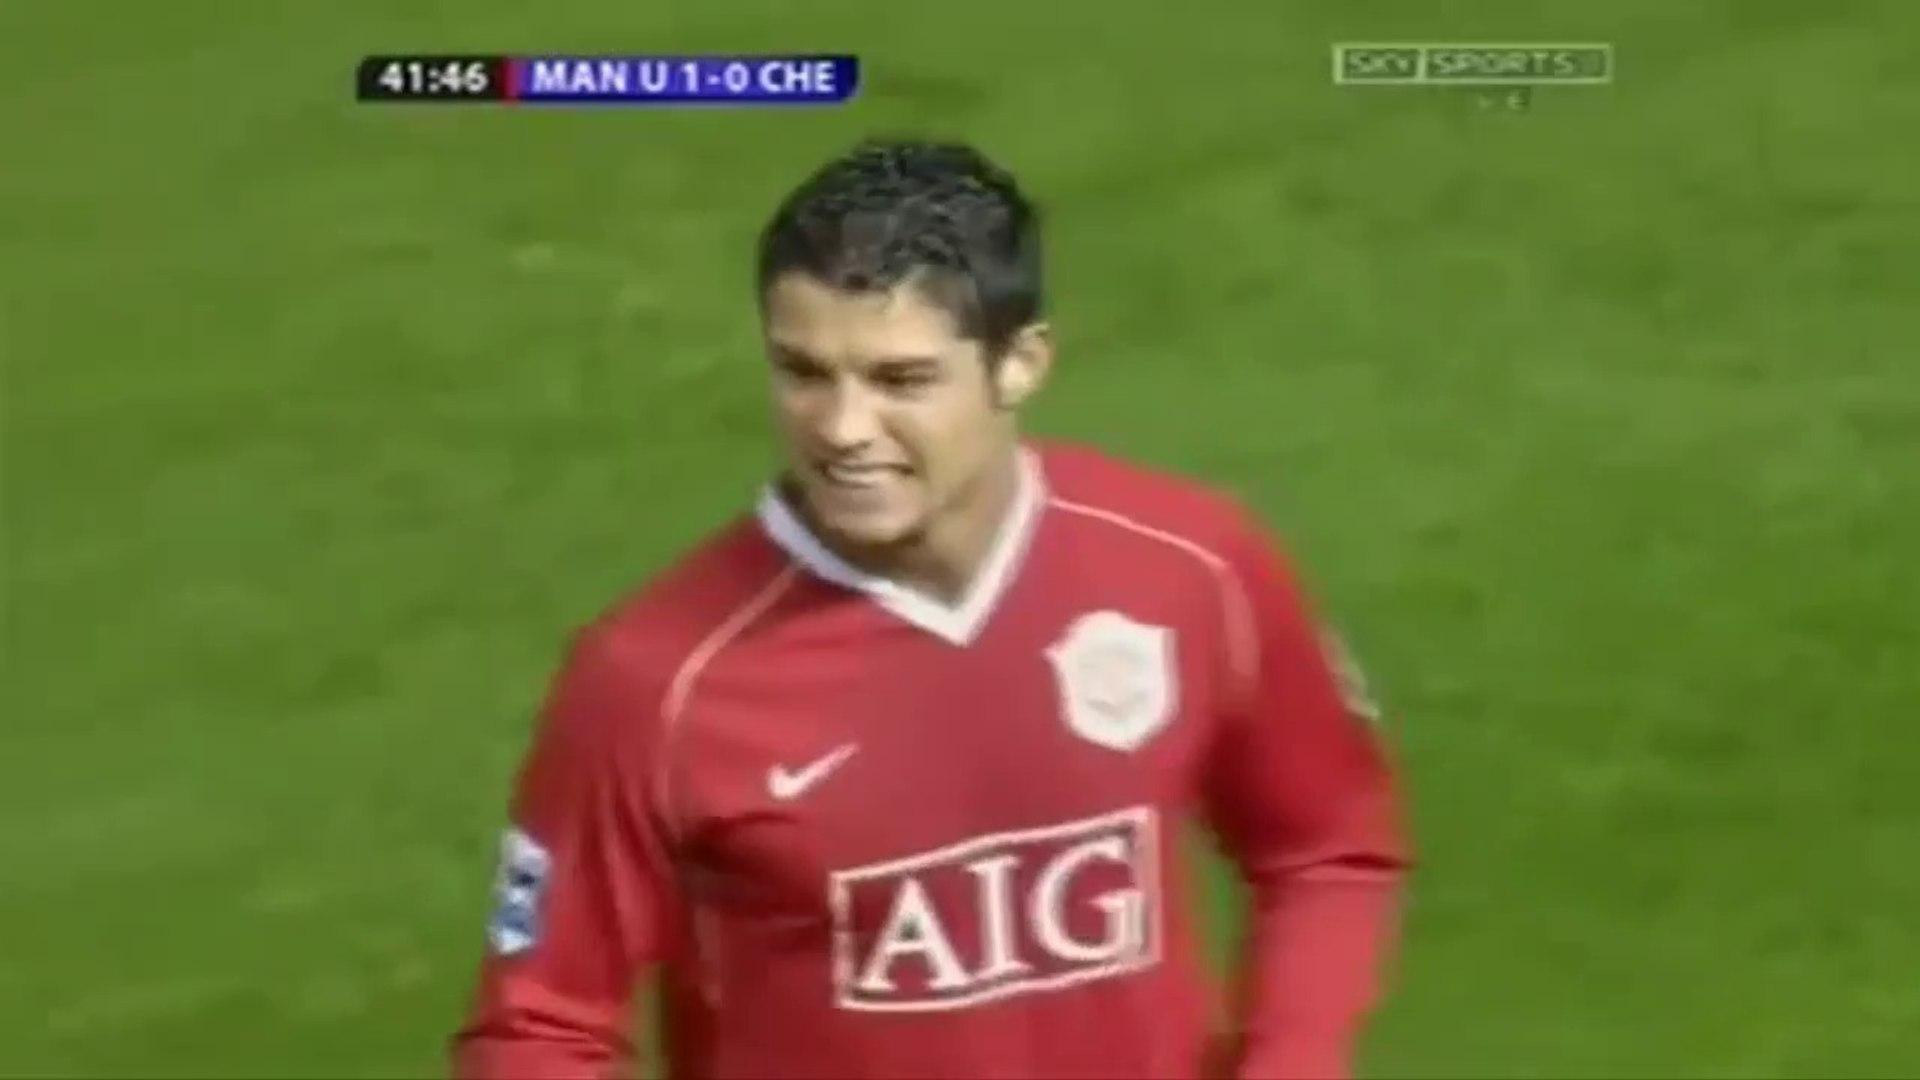 Cristiano Ronaldo ● Skills ● Manchester United 1:1 Chelsea ● Premier League 2006-07